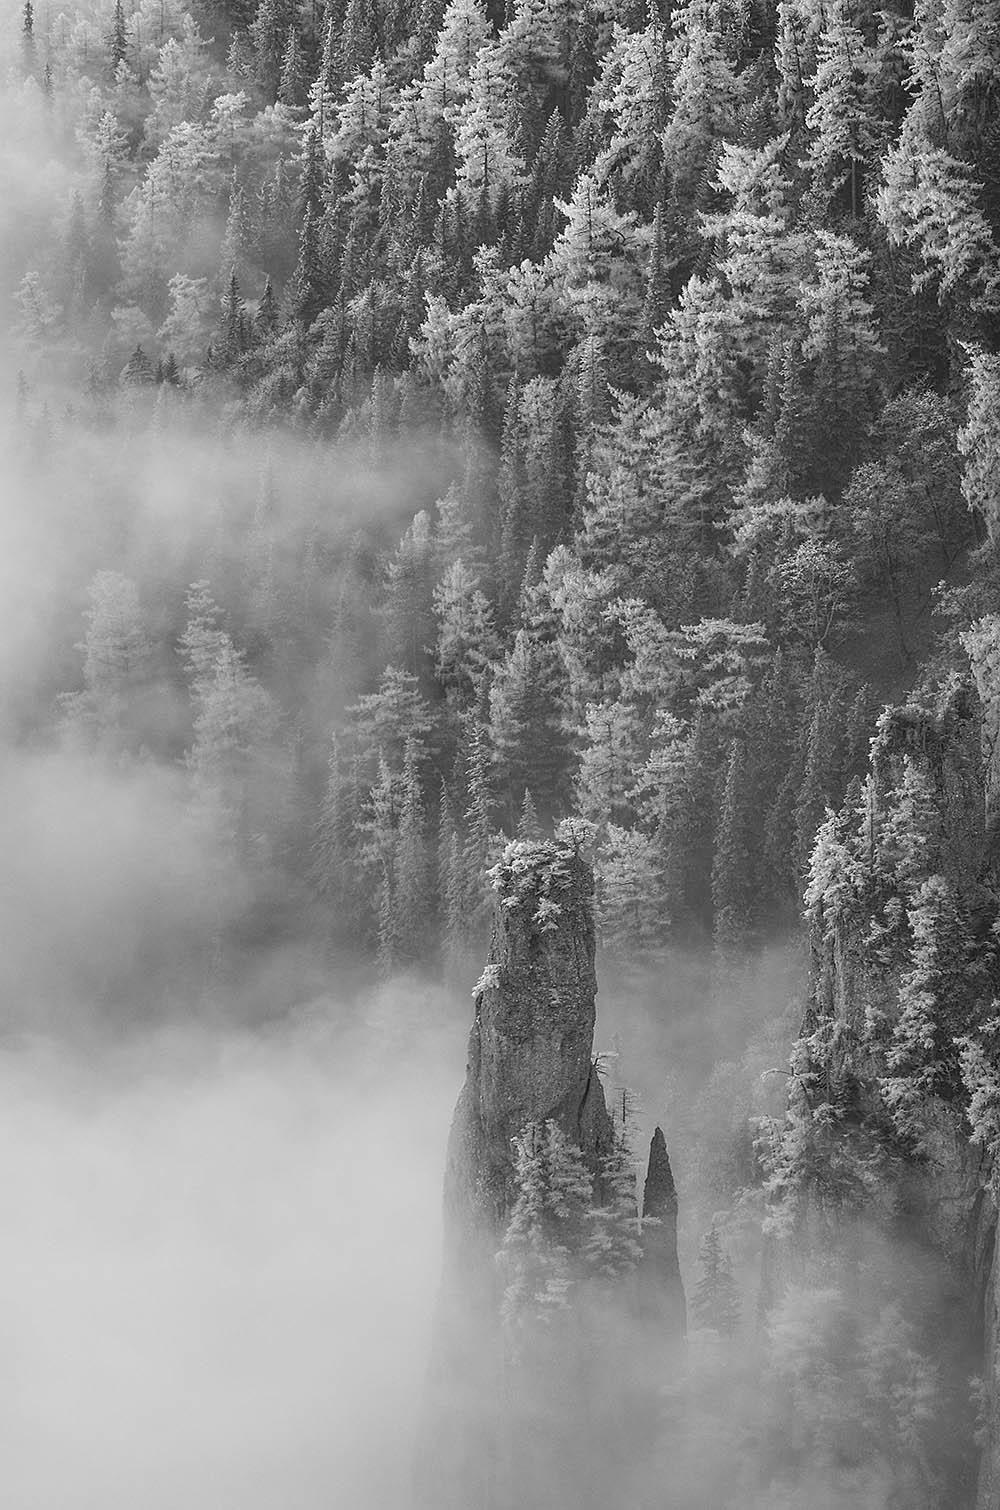 134.1. Untu Sorin. Turnul din ceata (Masivul Ceahlau)